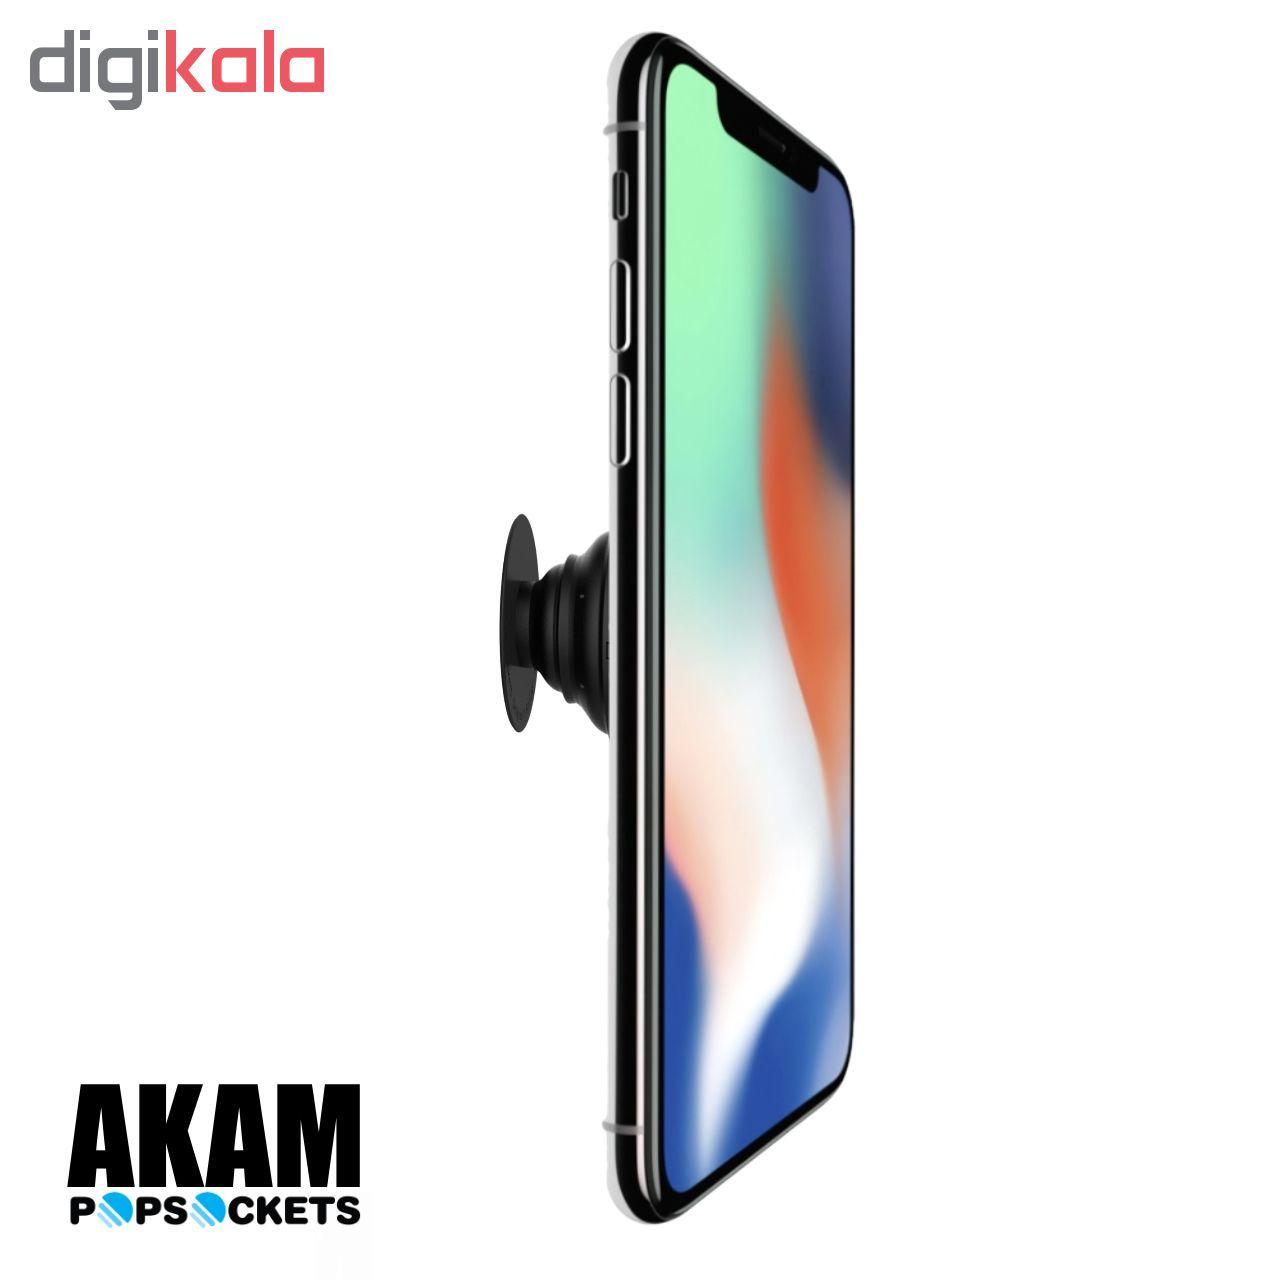 پایه نگهدارنده گوشی موبایل پاپ سوکت آکام مدل APS0168 main 1 9